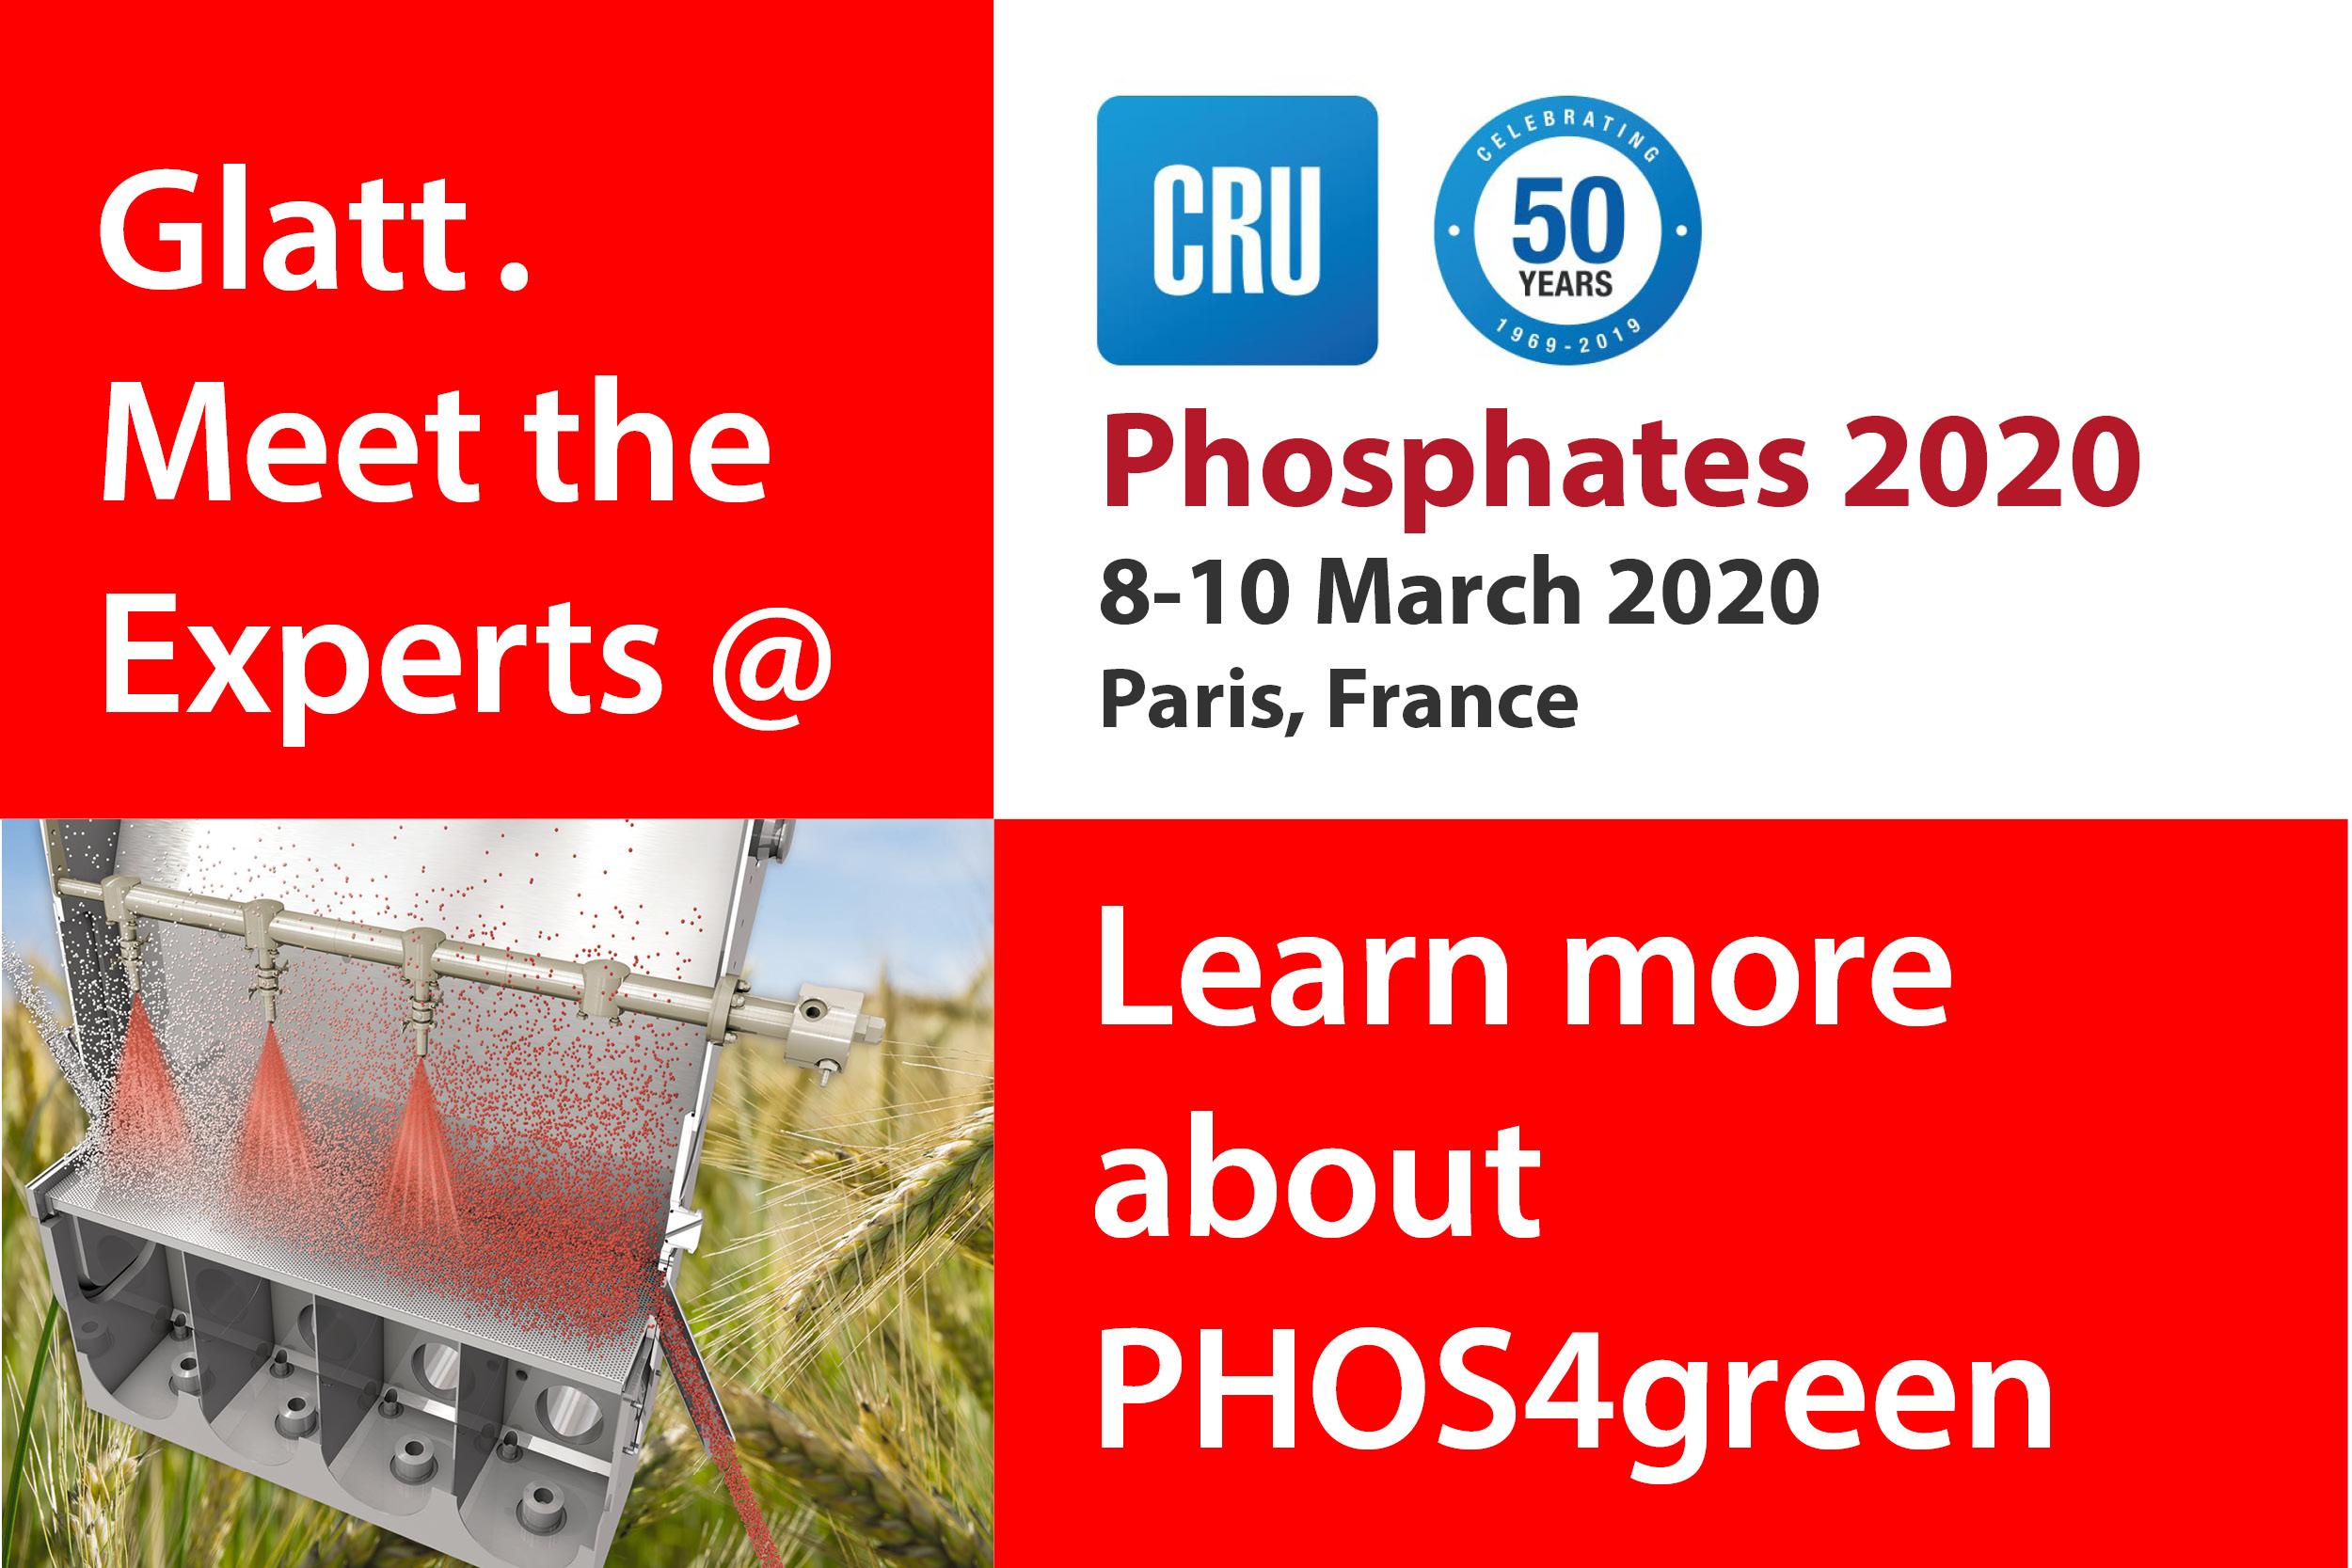 Glatt. Meet the Experts @ Phosphates 2020, 08-10 March in Paris, France